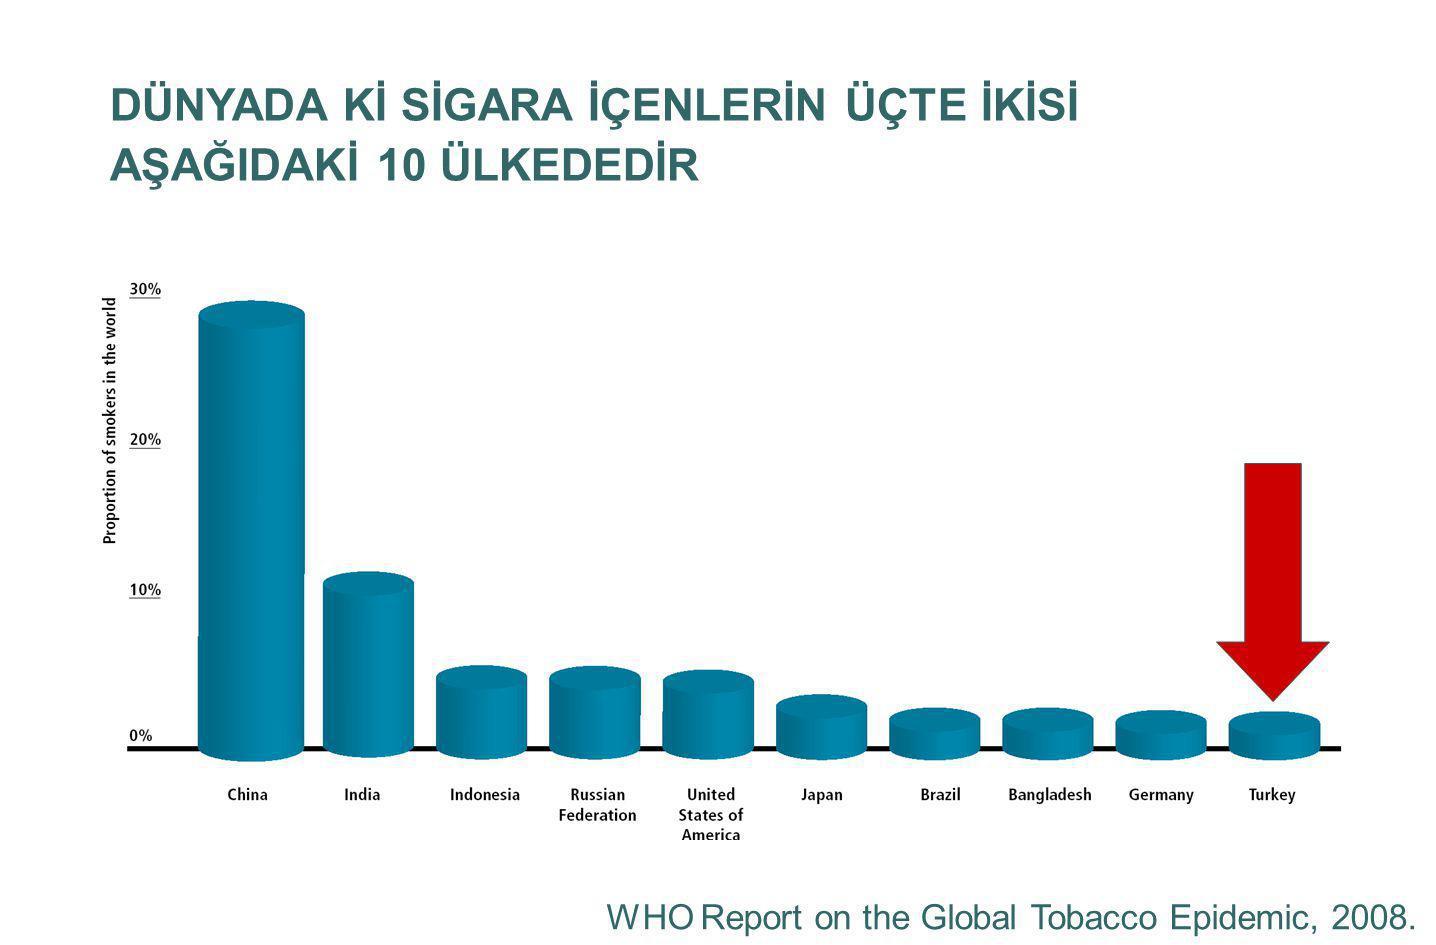 Etkin Tütün Kontrolü Fiyat : 30 puan Sigara yasak ve kısıtlaması: 22 puan Tütün kontrolüne kaynak : 15 puan Reklam yasağı: 13 puan Sigara bırakma: 10 puan Uyarı yazıları: 10 puan